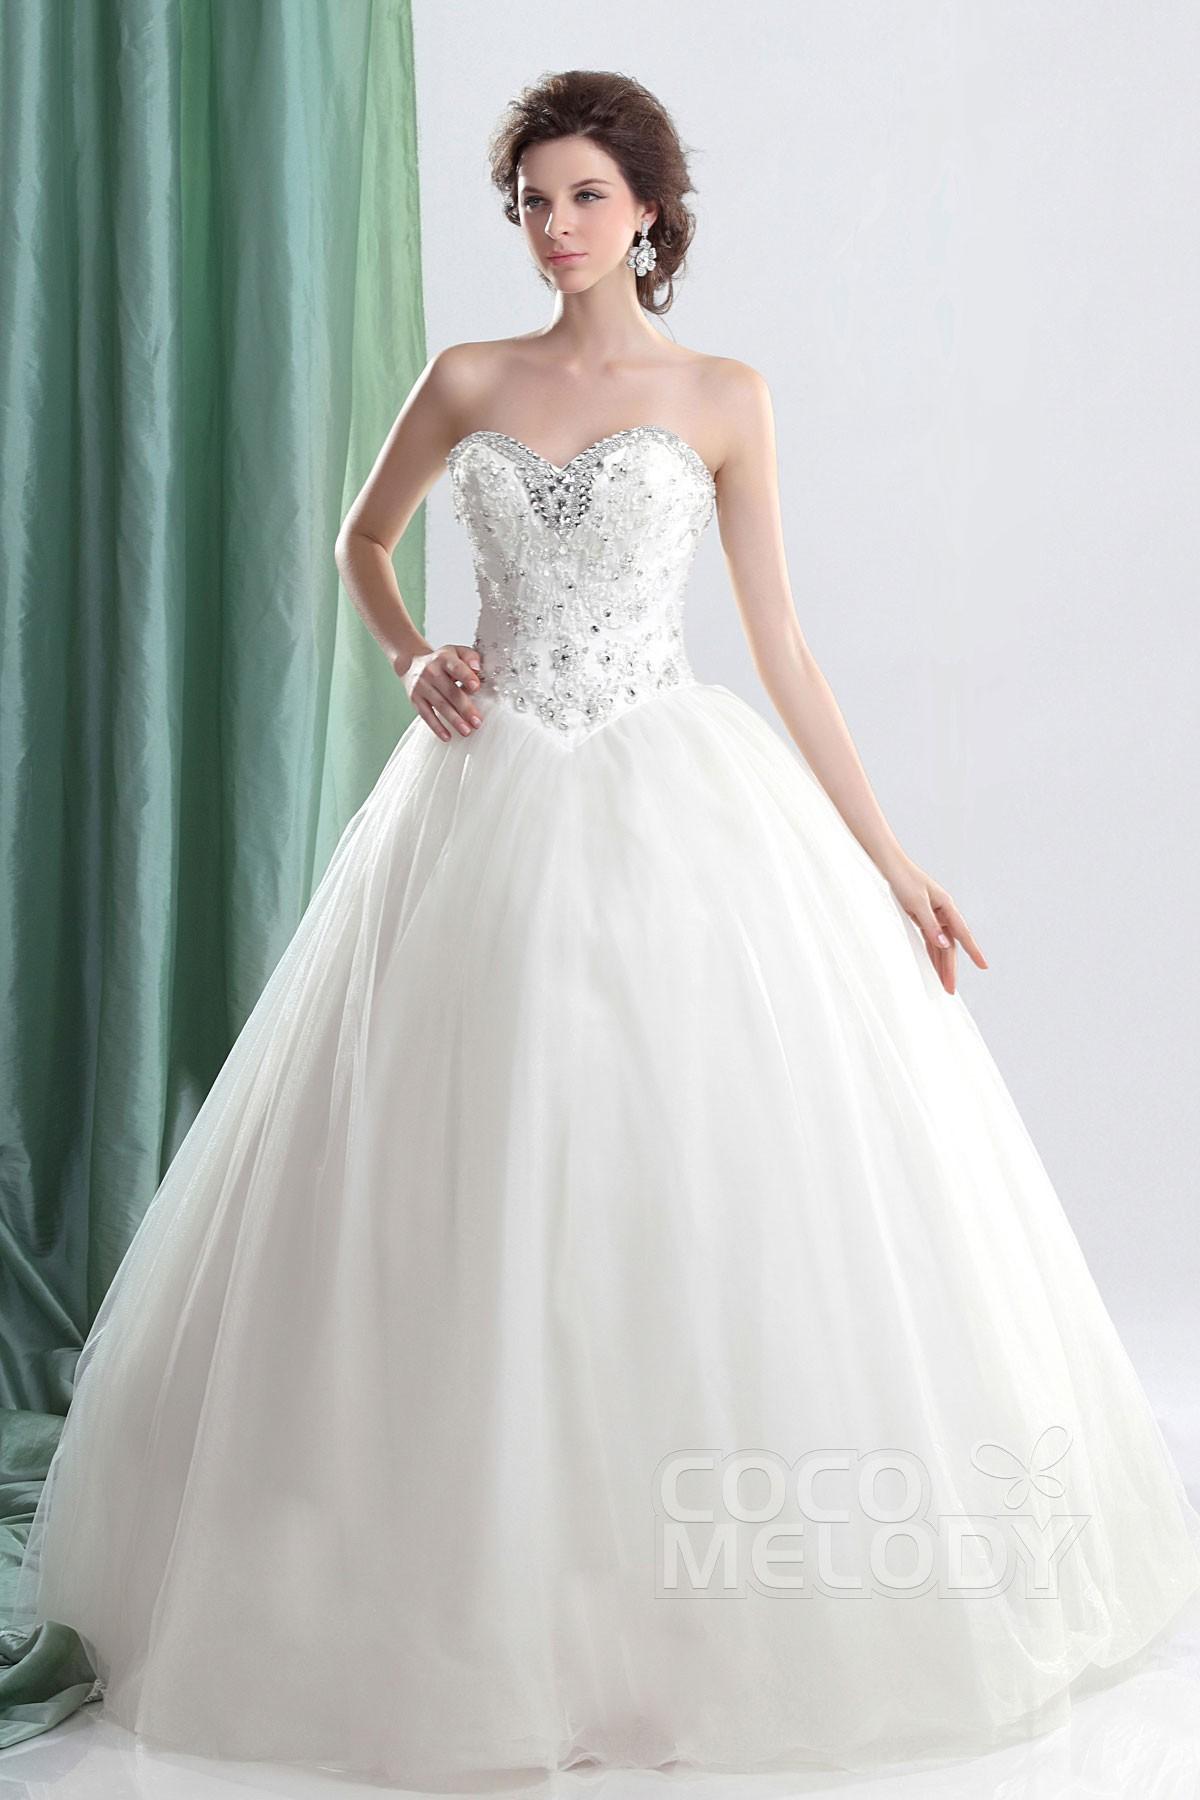 Ball Gown Sweetheart Basque Floor Length Tulle Wedding Dress CWLF13008